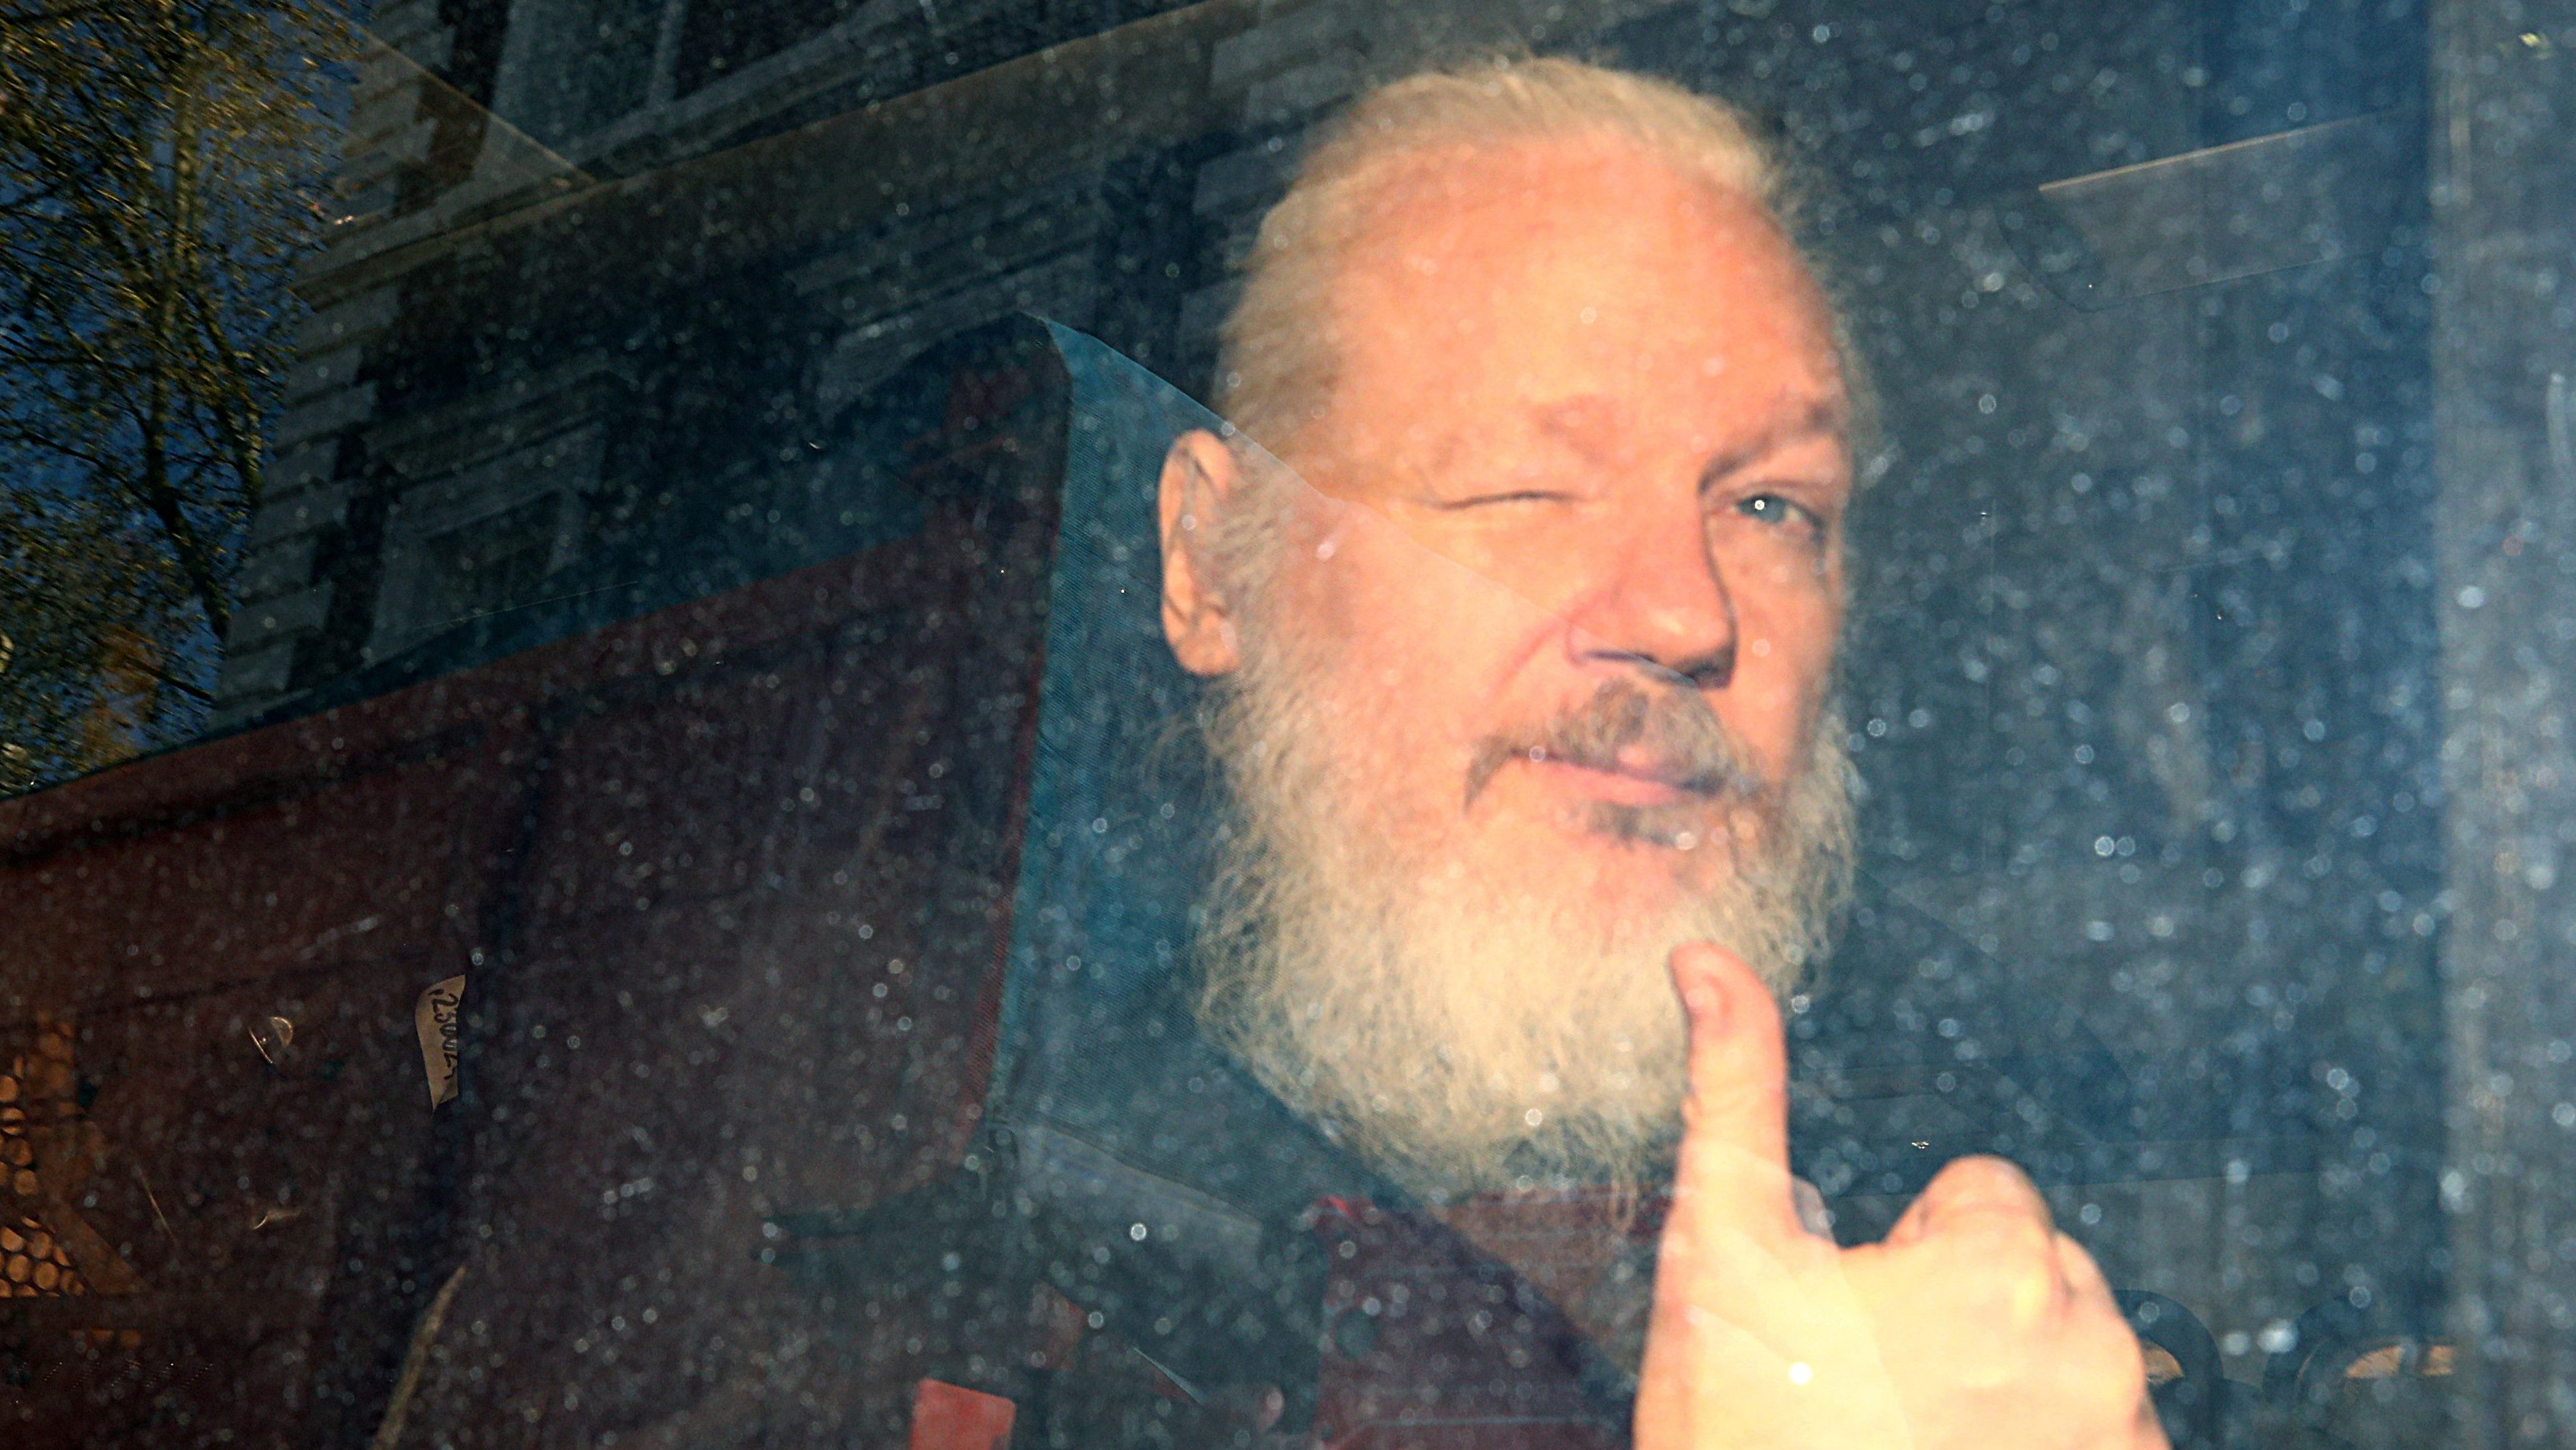 NSA lawyers explains Assange charges